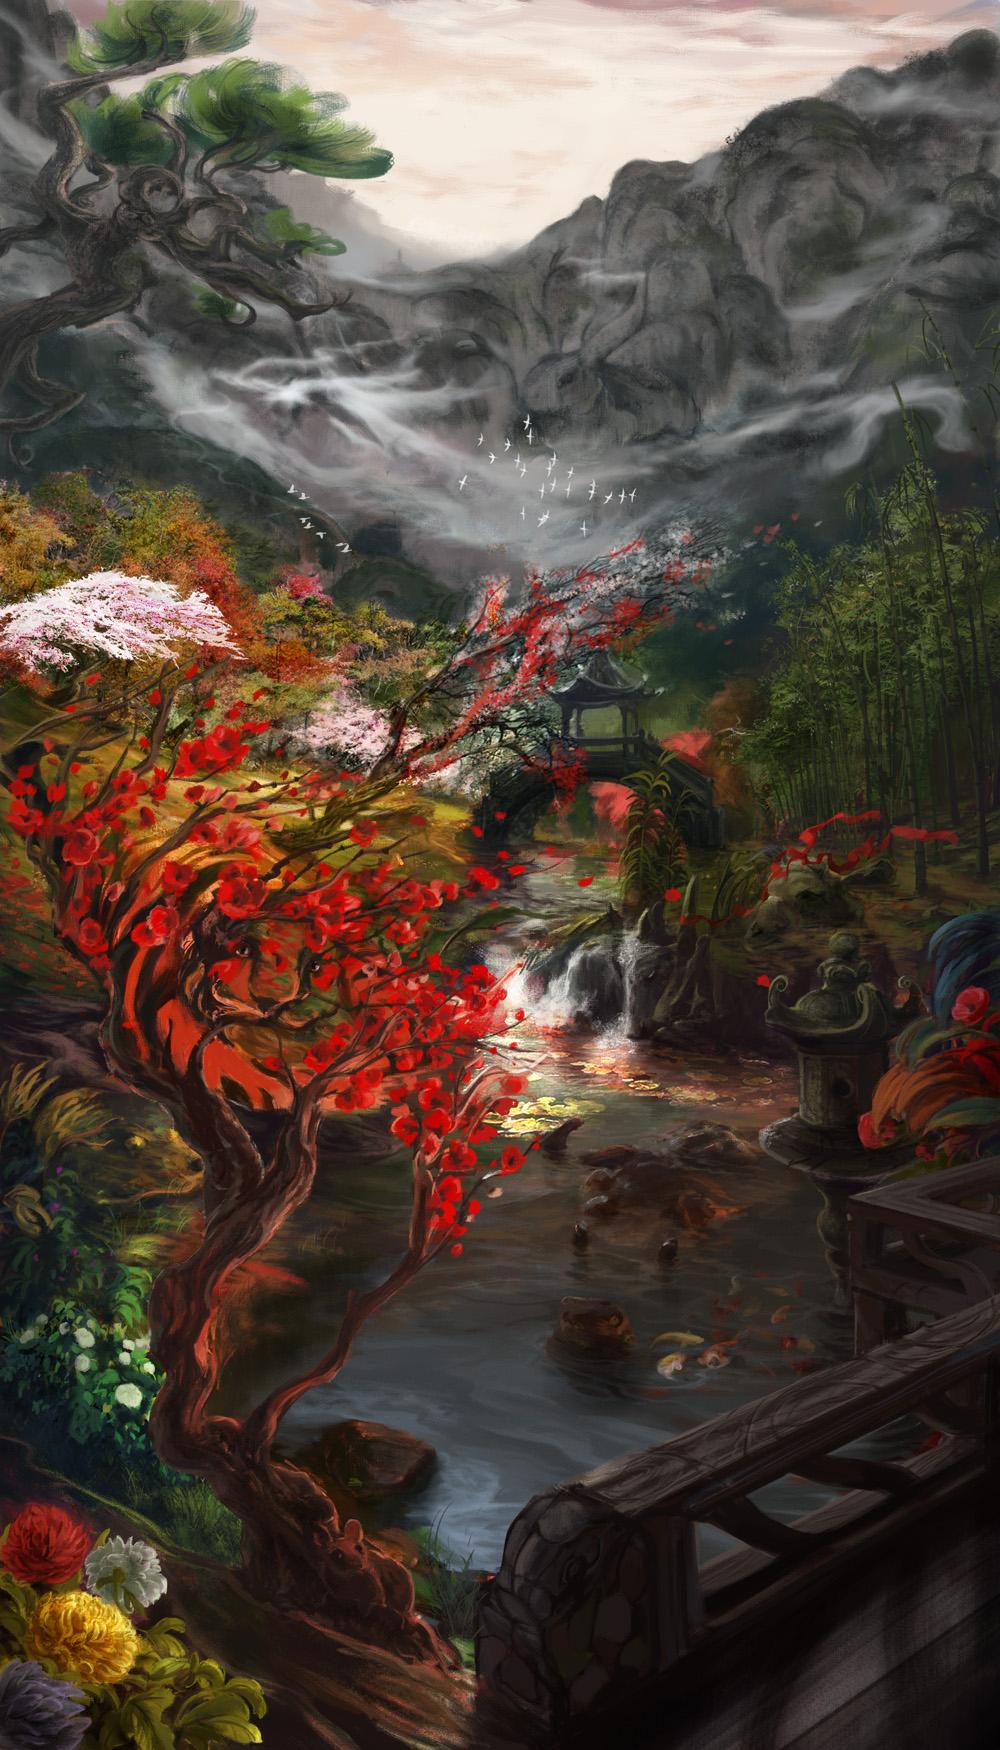 Gong Xi Fa Cai By Firedudewraith On DeviantArt